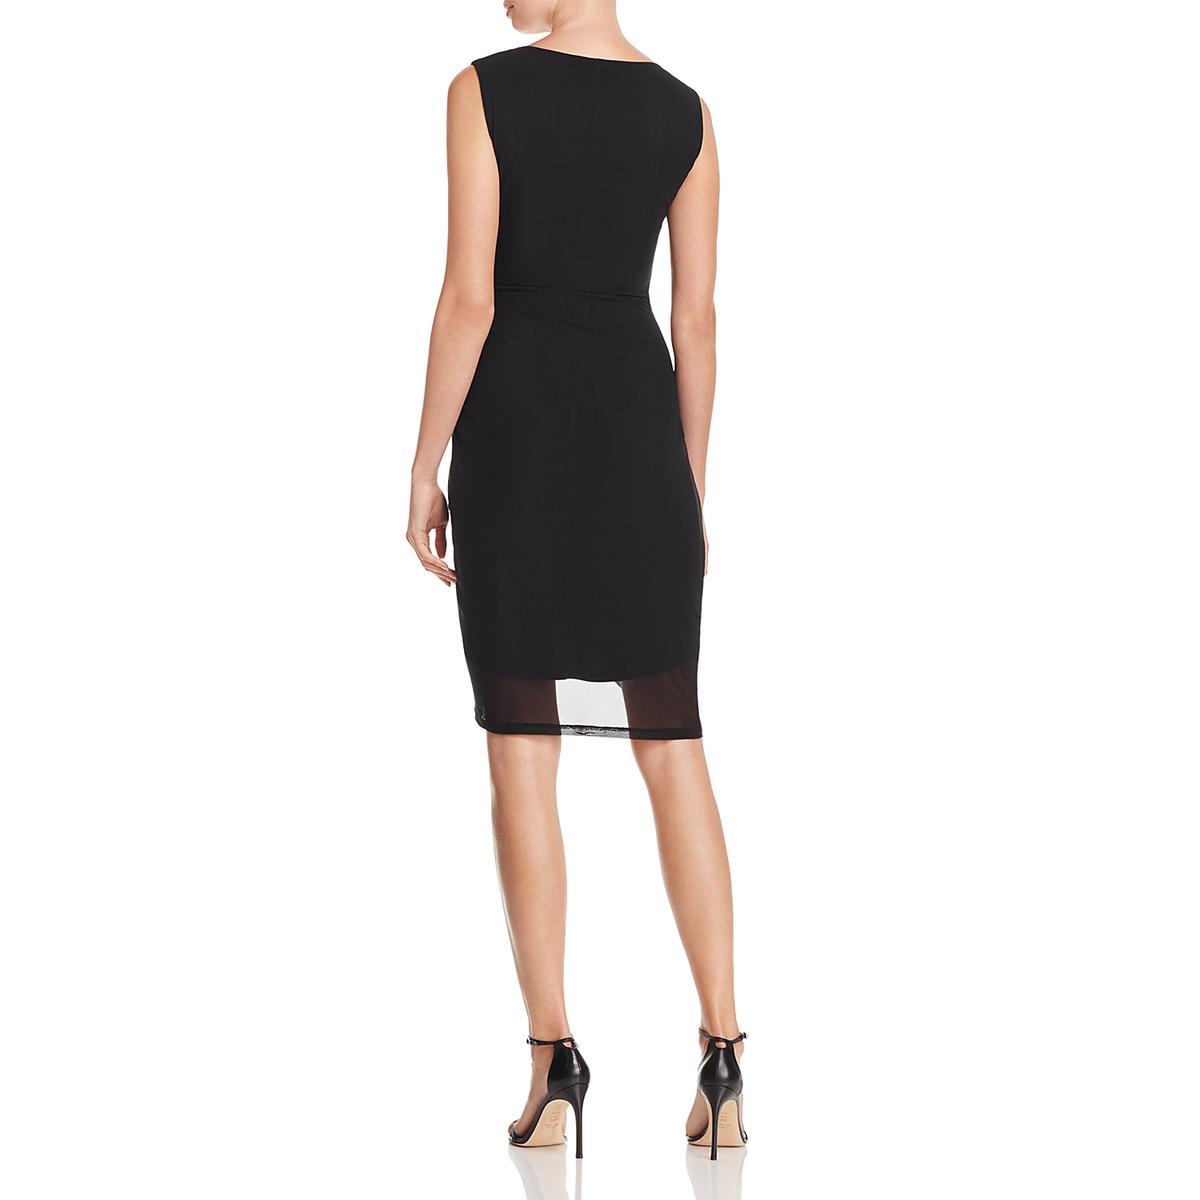 b77cb0e0c27f Details about T Tahari Womens Bellini Black Twist Front Party Cocktail Dress  XL BHFO 8721